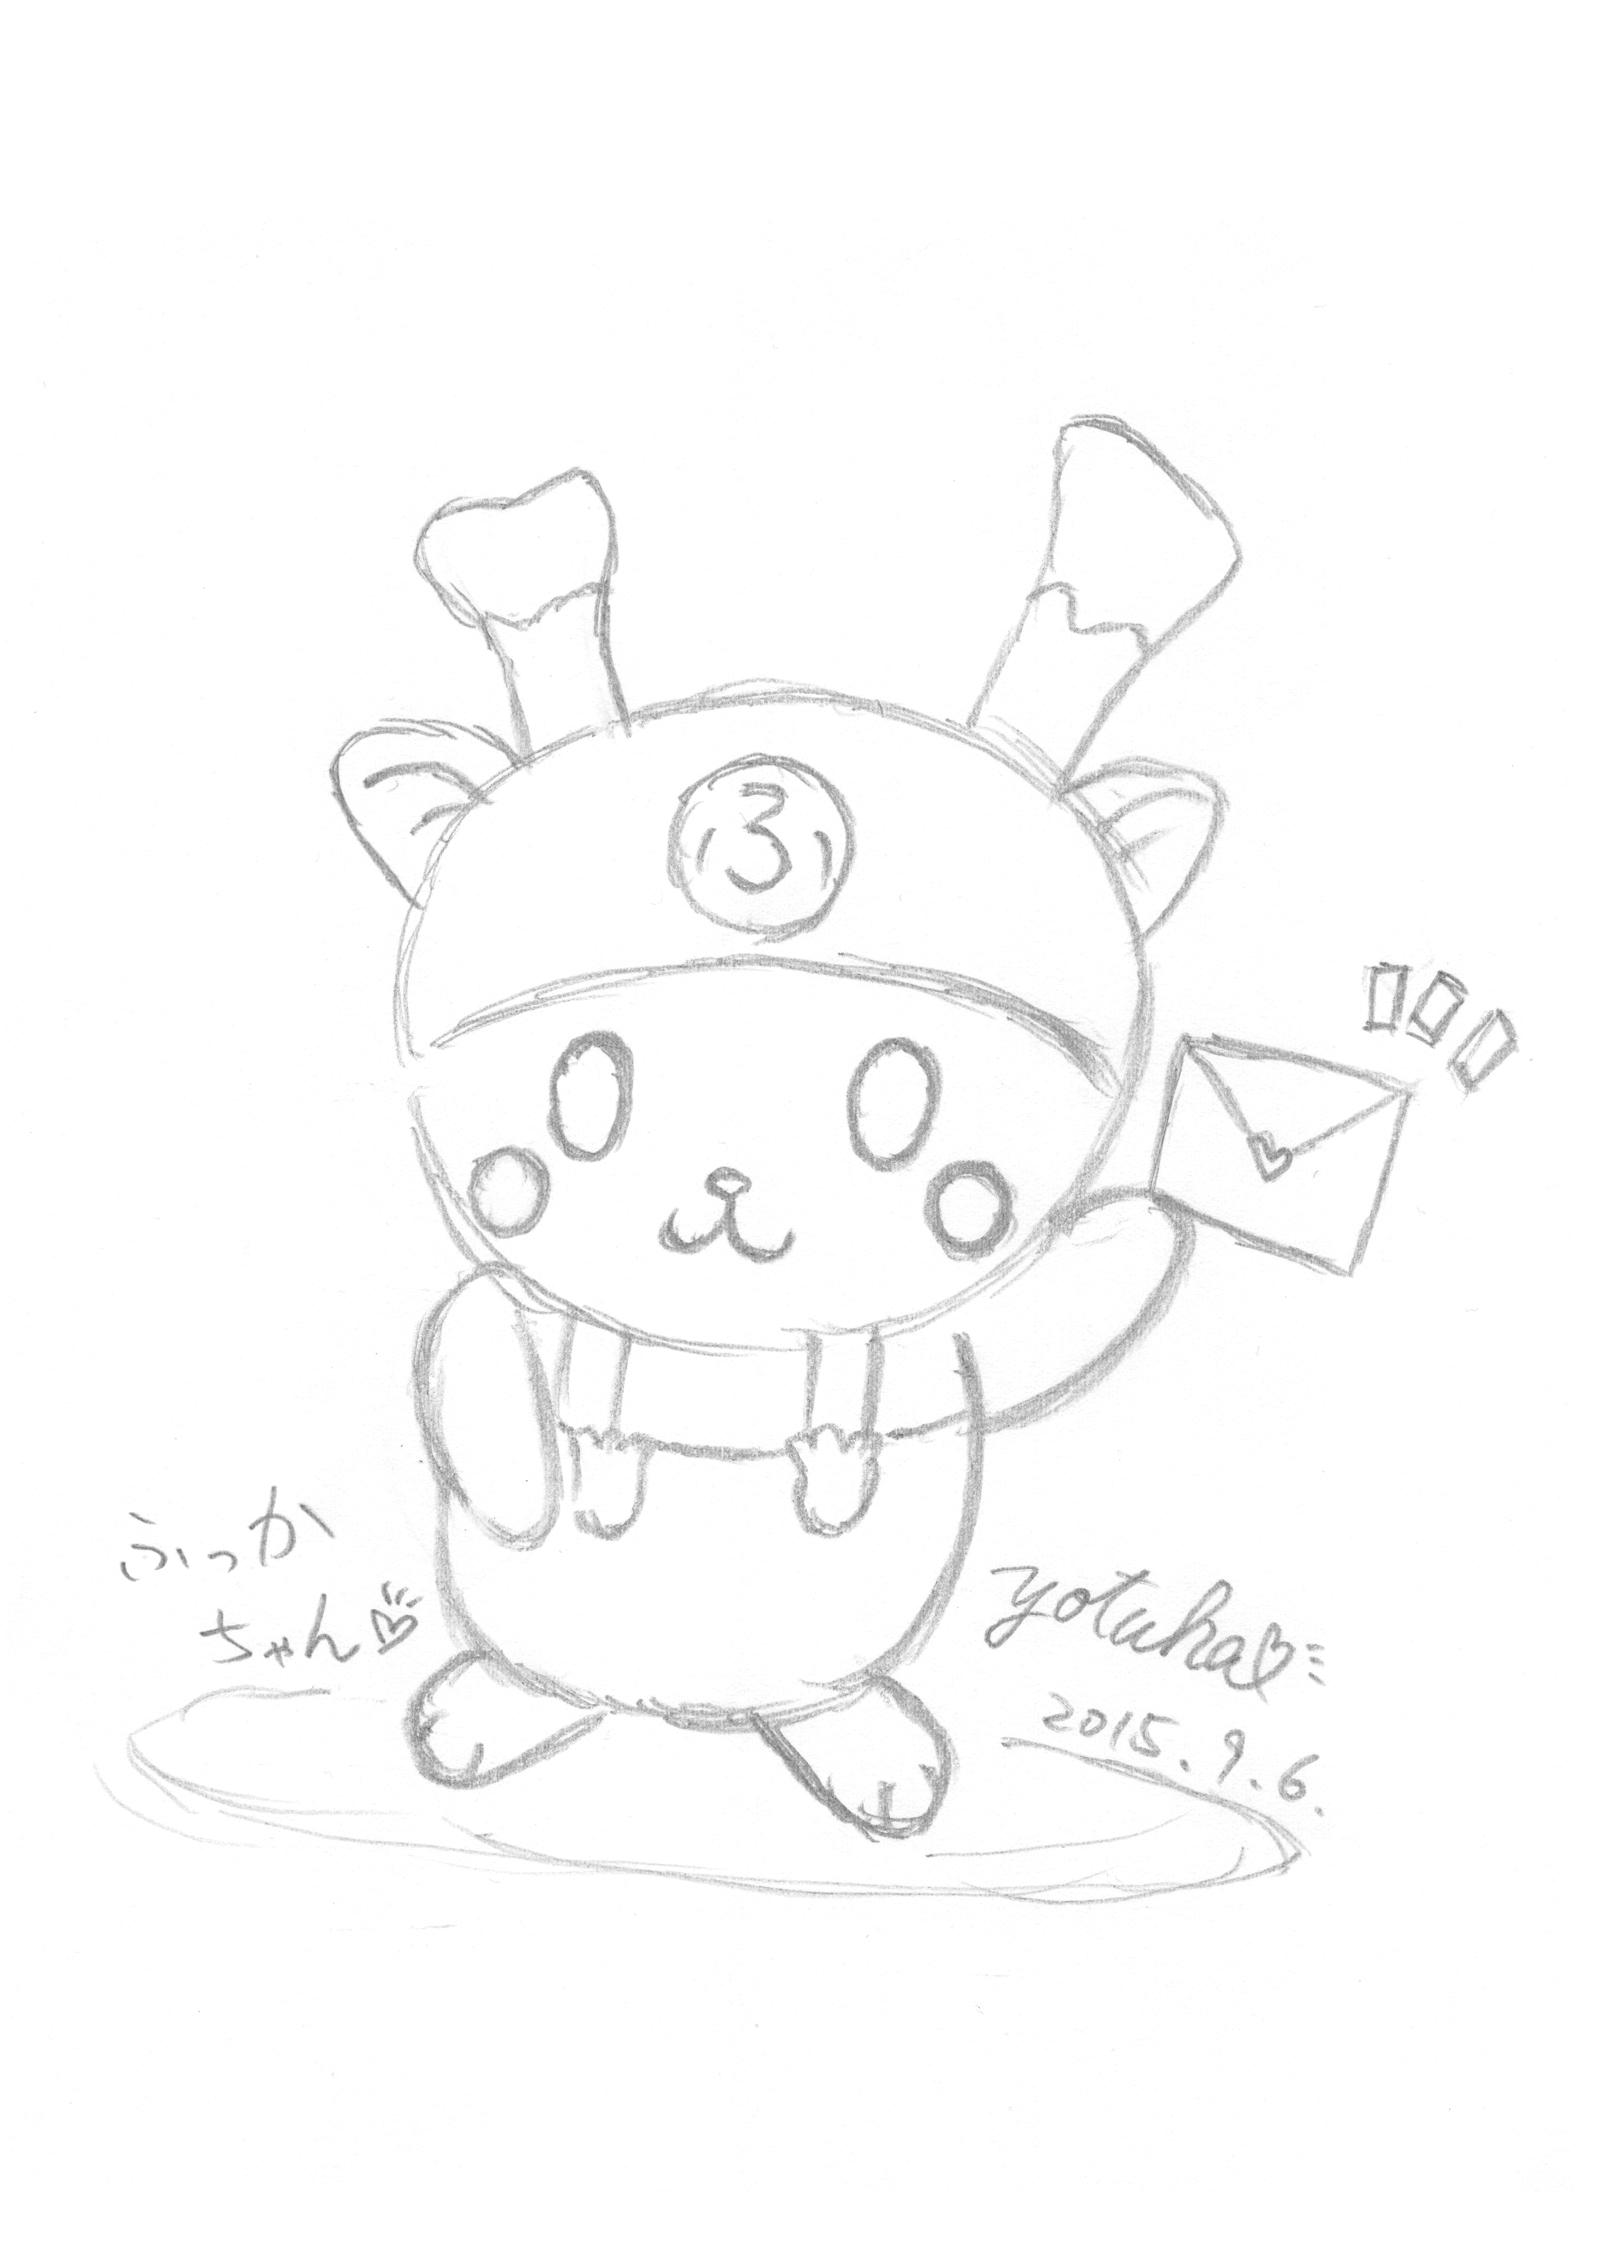 20150906_fukkachan.jpg